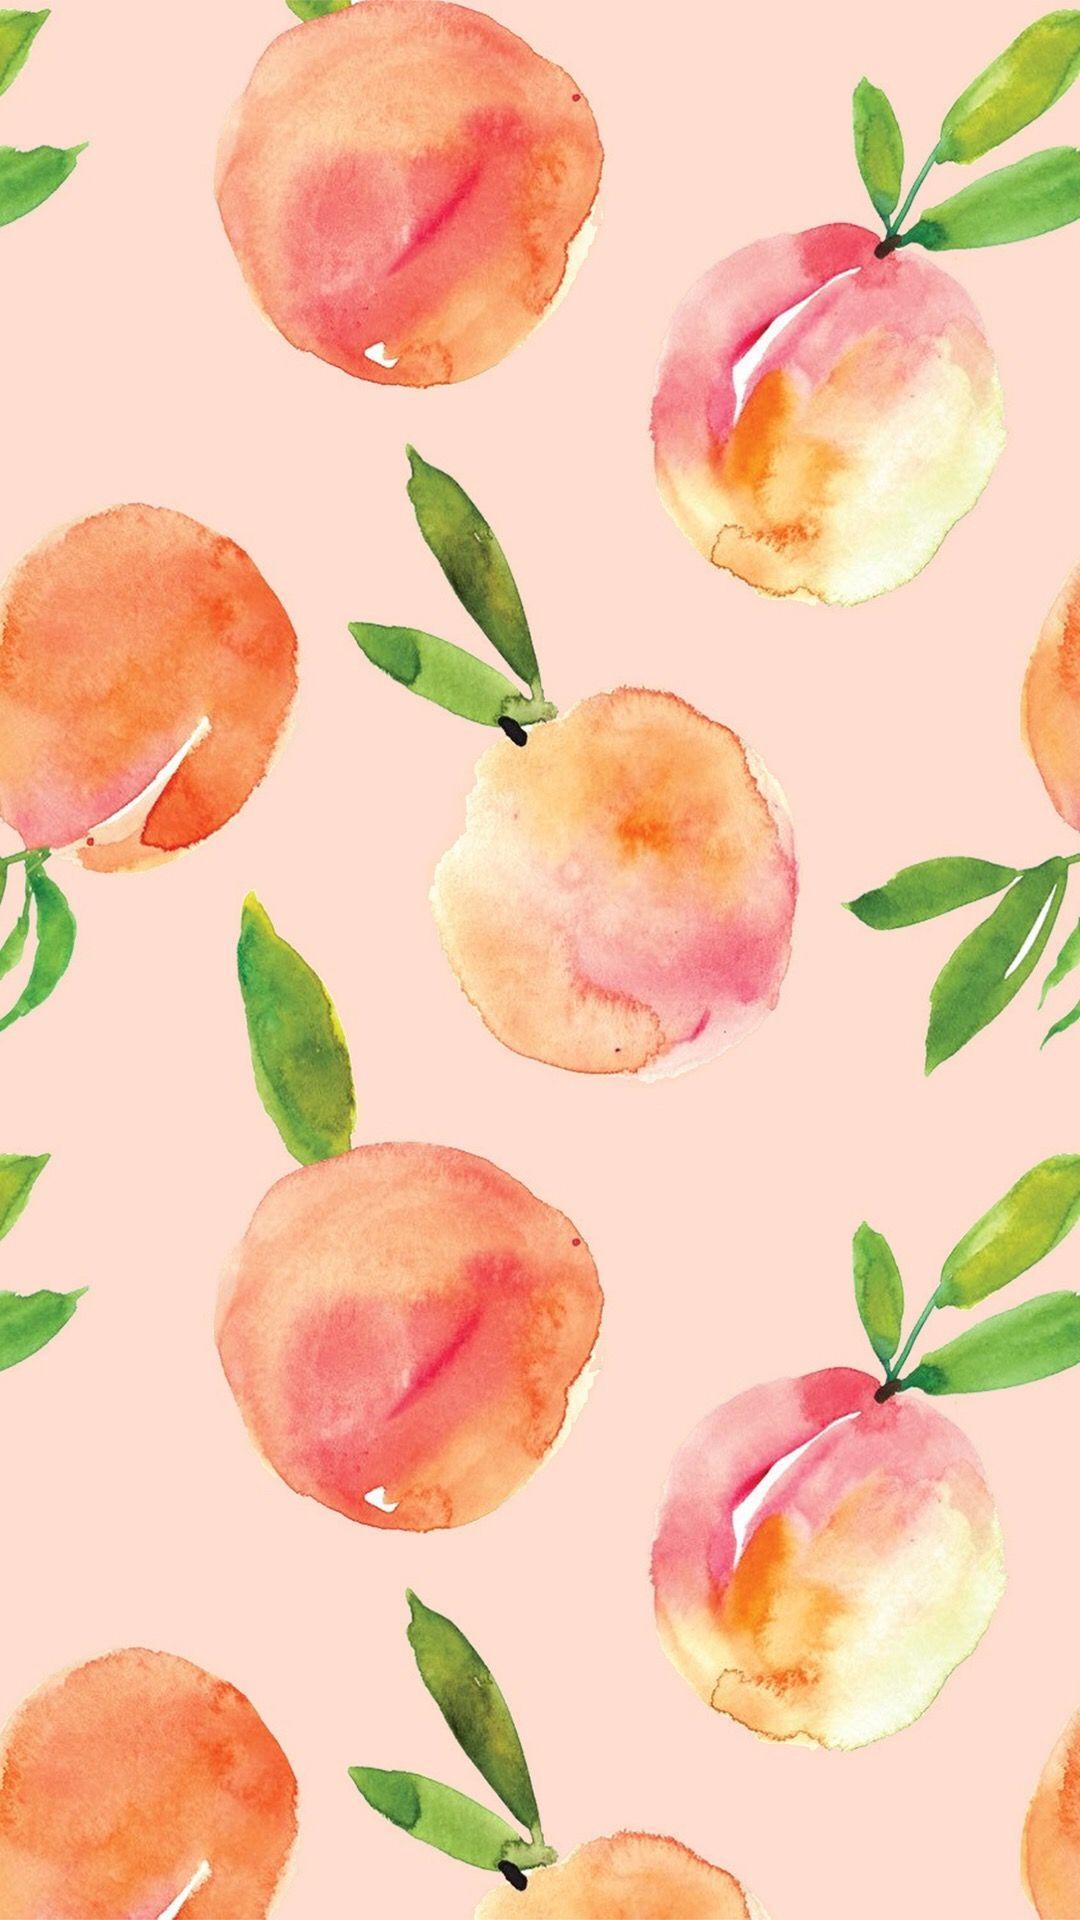 Summer Watercolor Background : summer, watercolor, background, Summer, Watercolor, Wallpapers, Backgrounds, WallpaperAccess